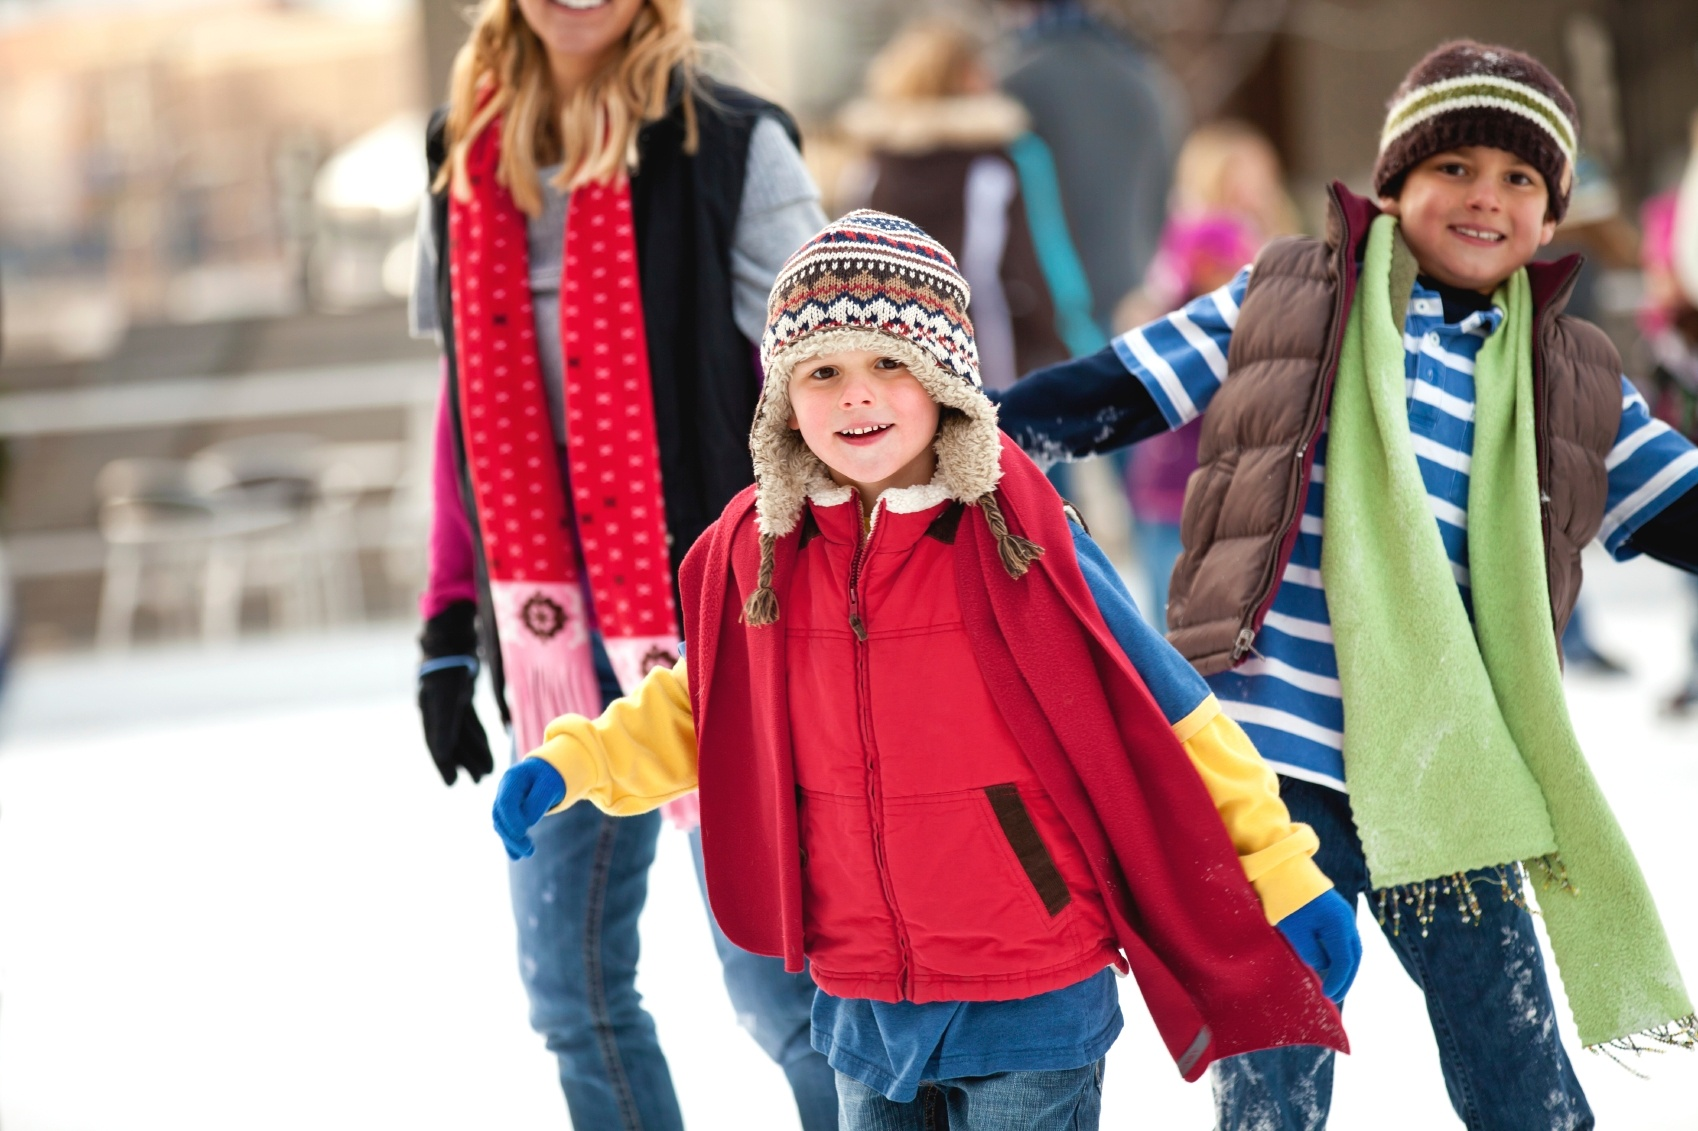 family-skating-outdoors1.jpg